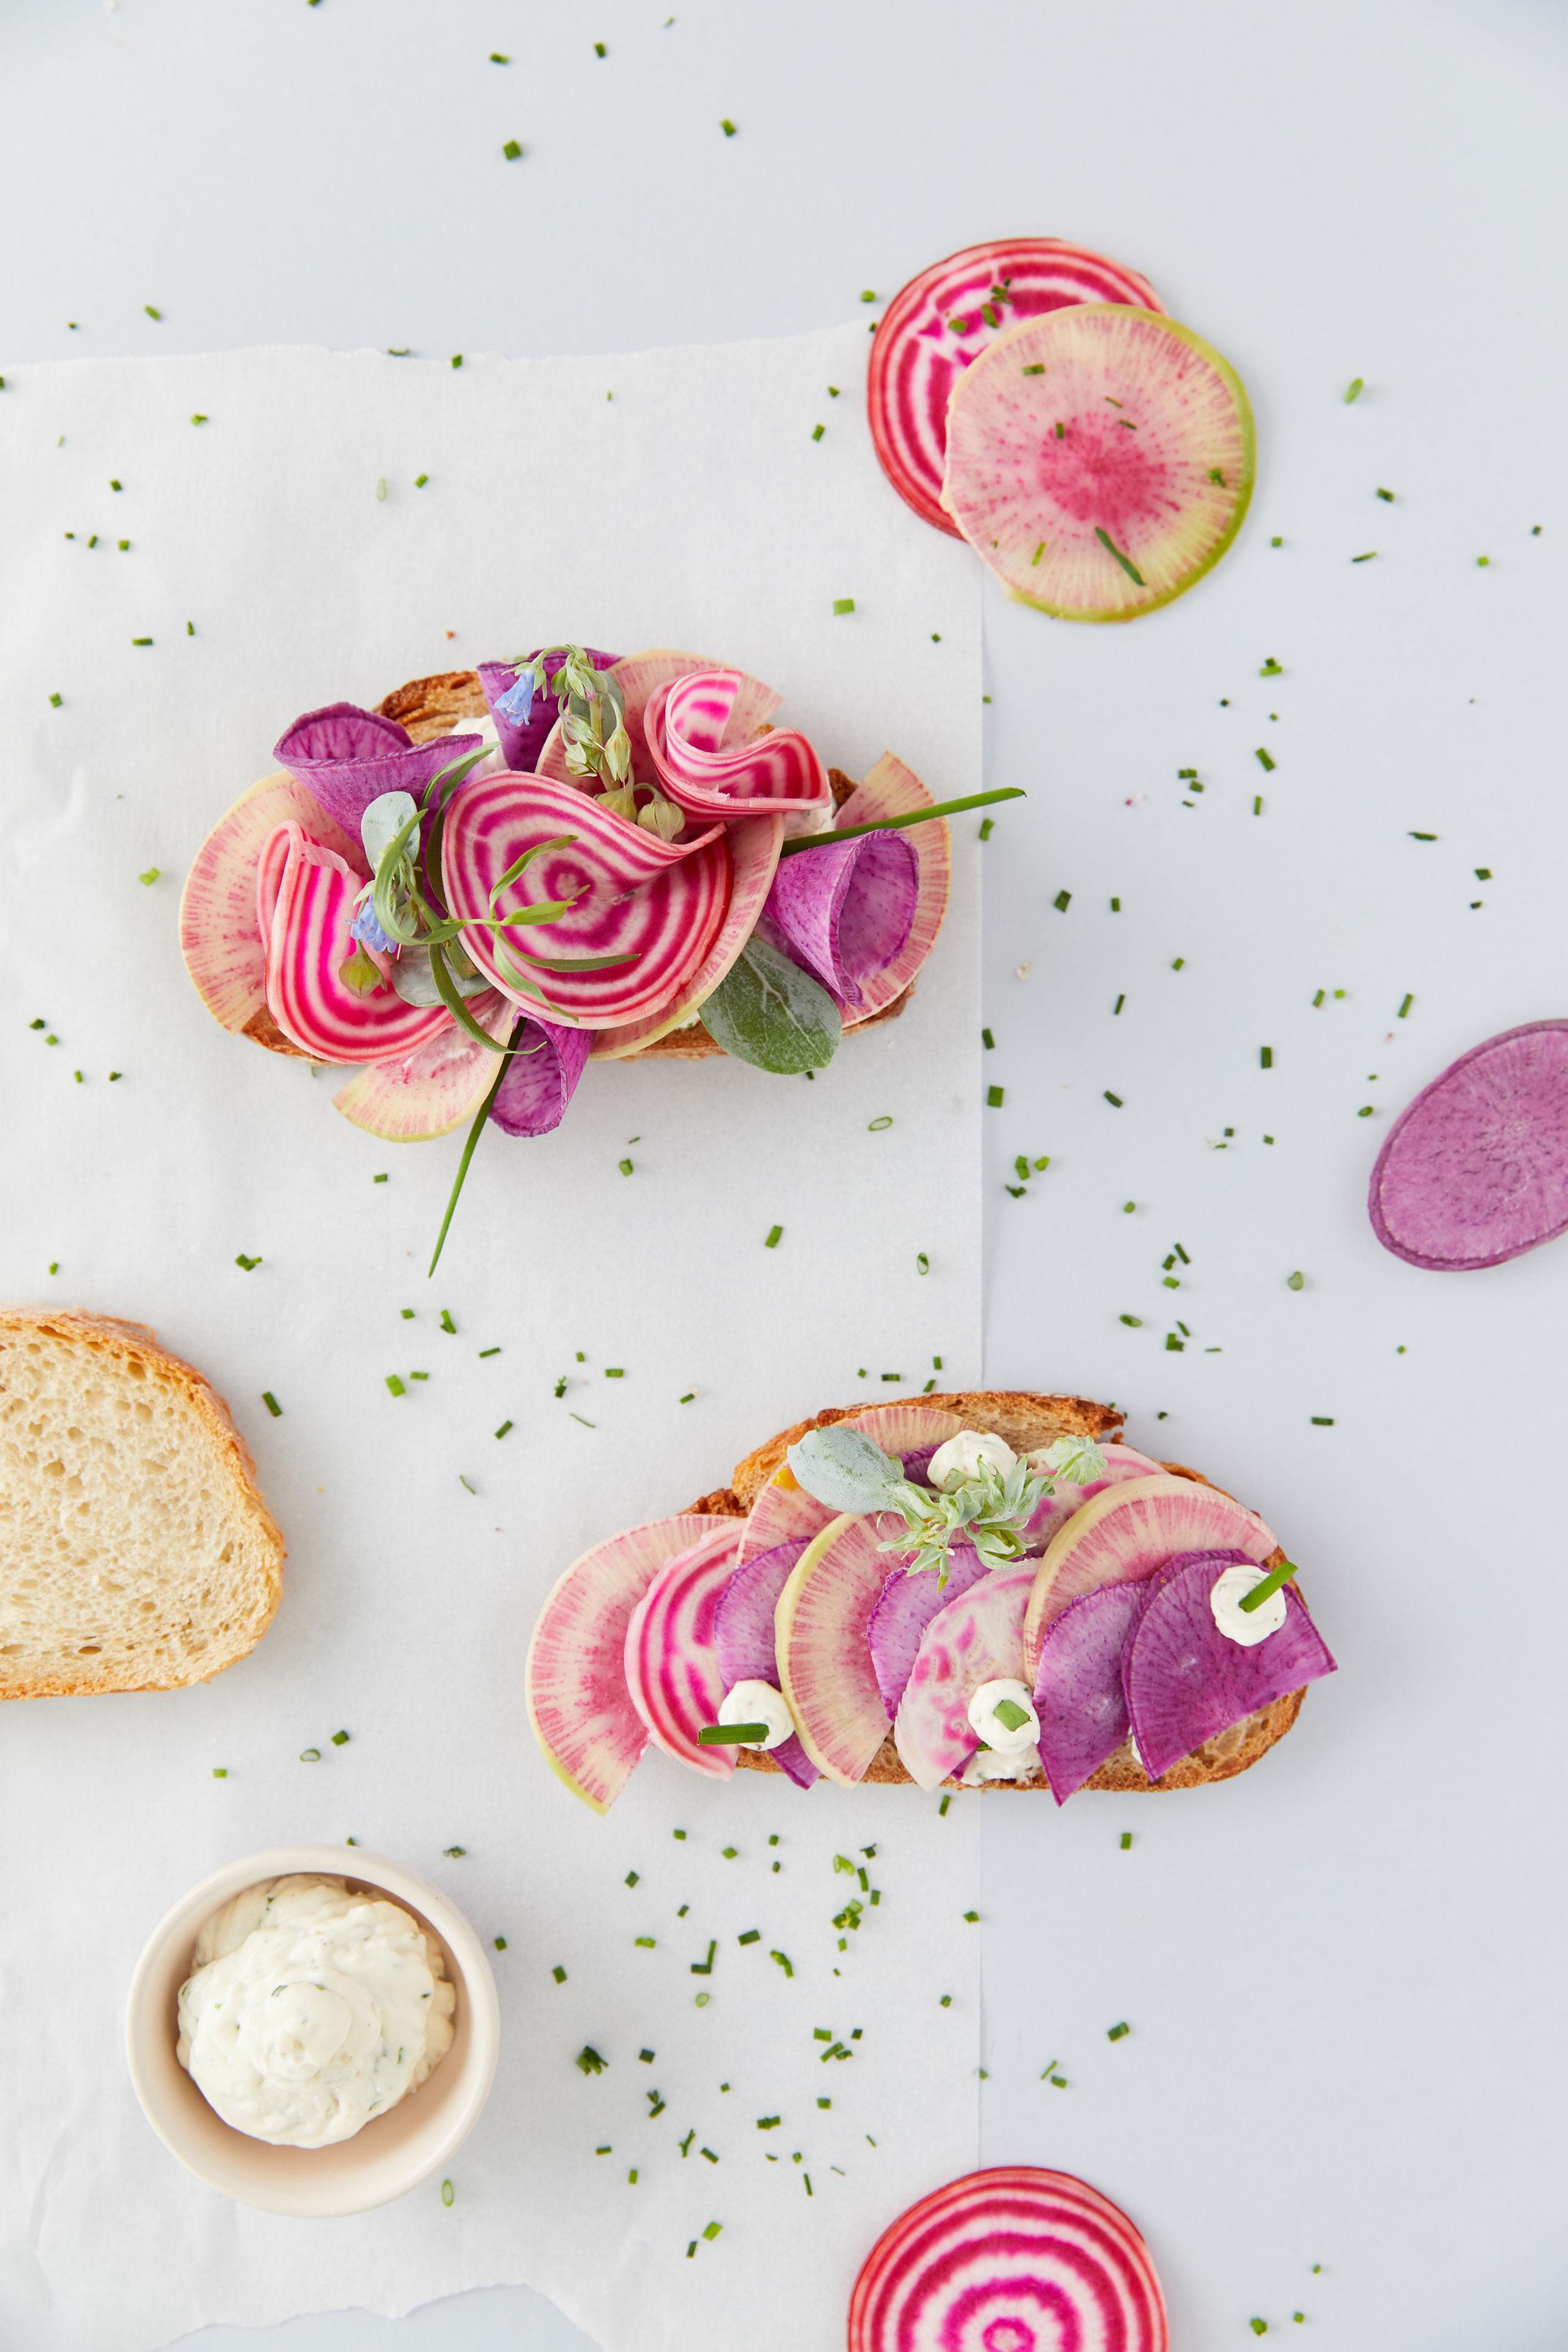 photographe culinaire en studio en Bretagne